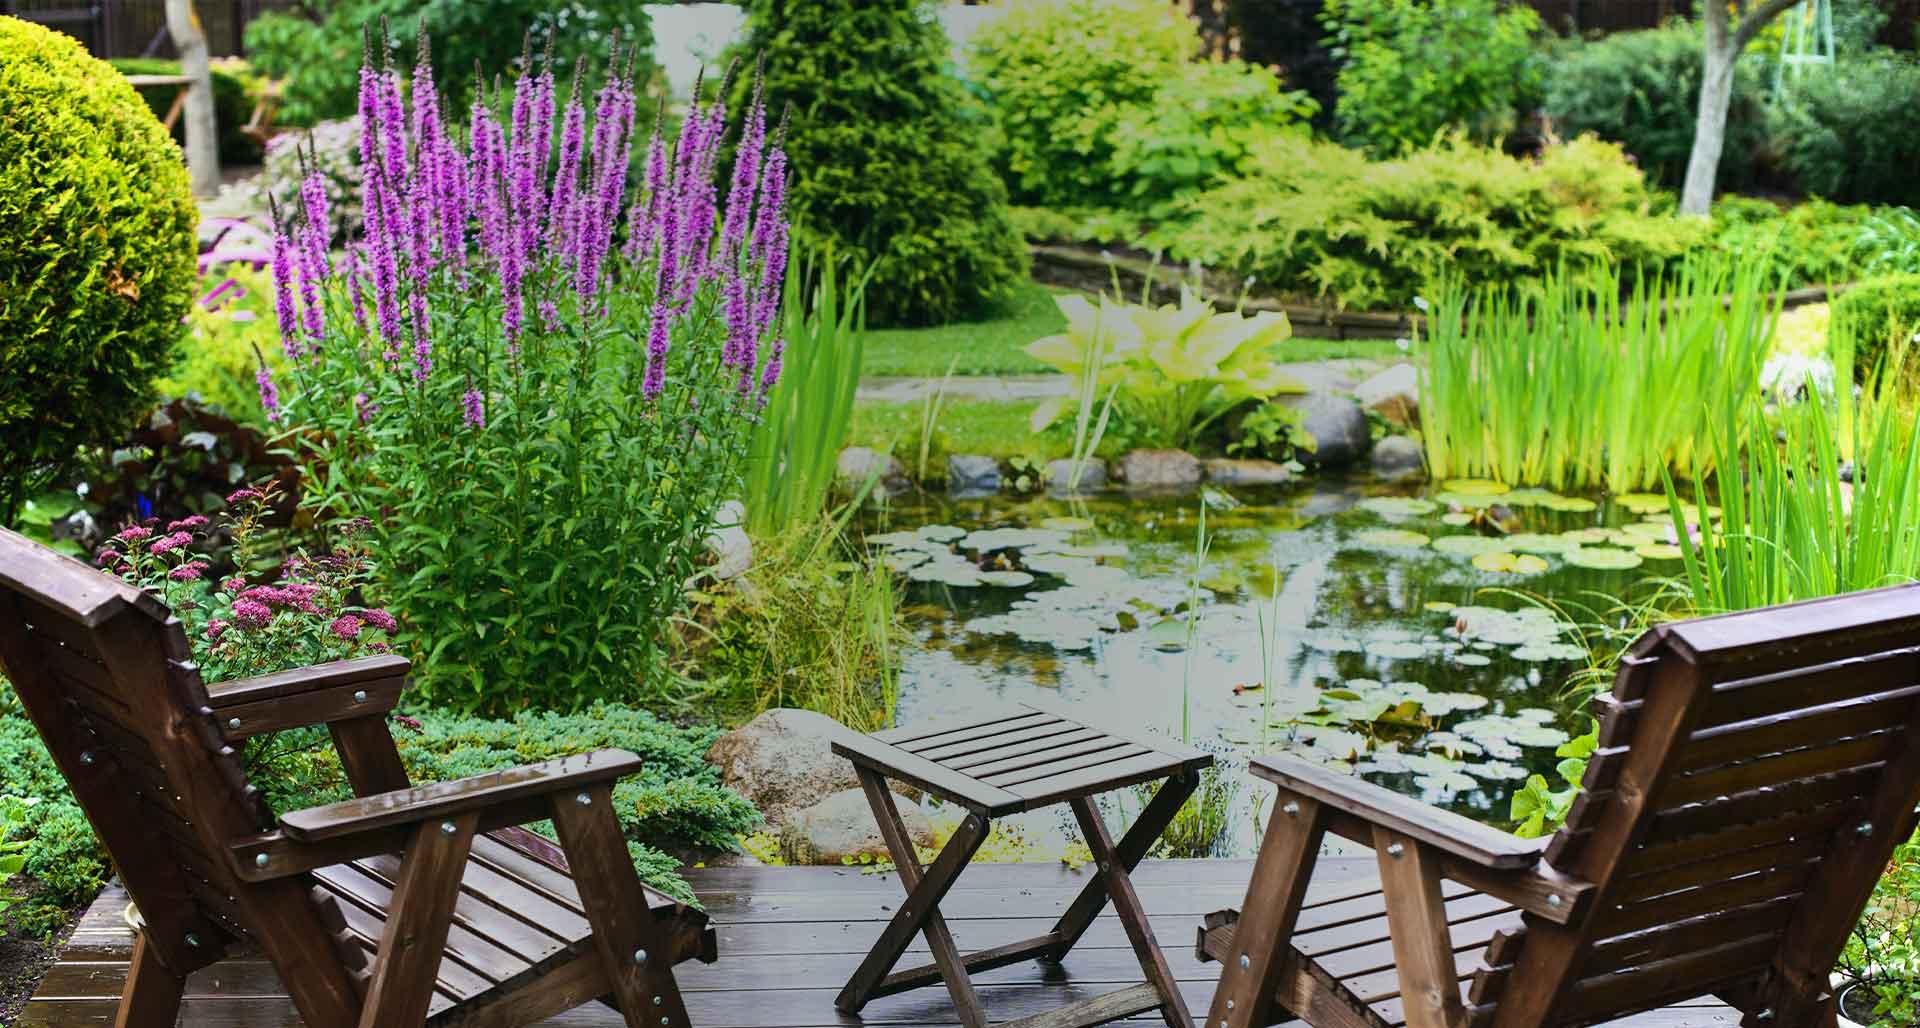 Jardineries Truffaut : Spécialiste Jardin, Animaux, Maison ... concernant Arbre Pour Petit Jardin